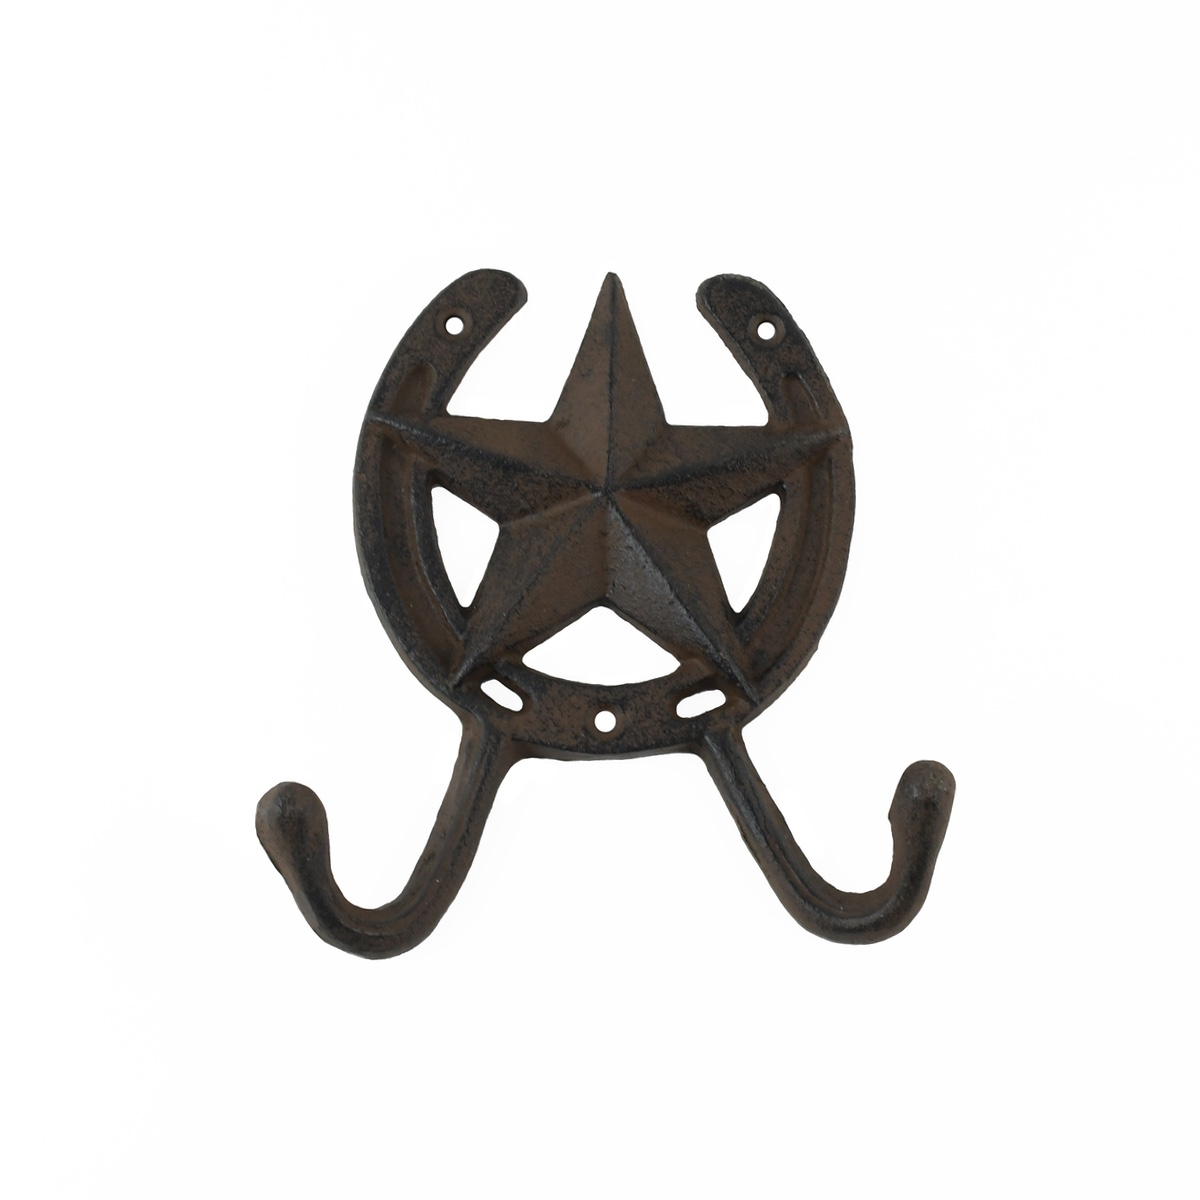 Cast Iron Horseshoe Key Hook Star Kitchen Bathroom Towel Holder Wall Coat Hanger